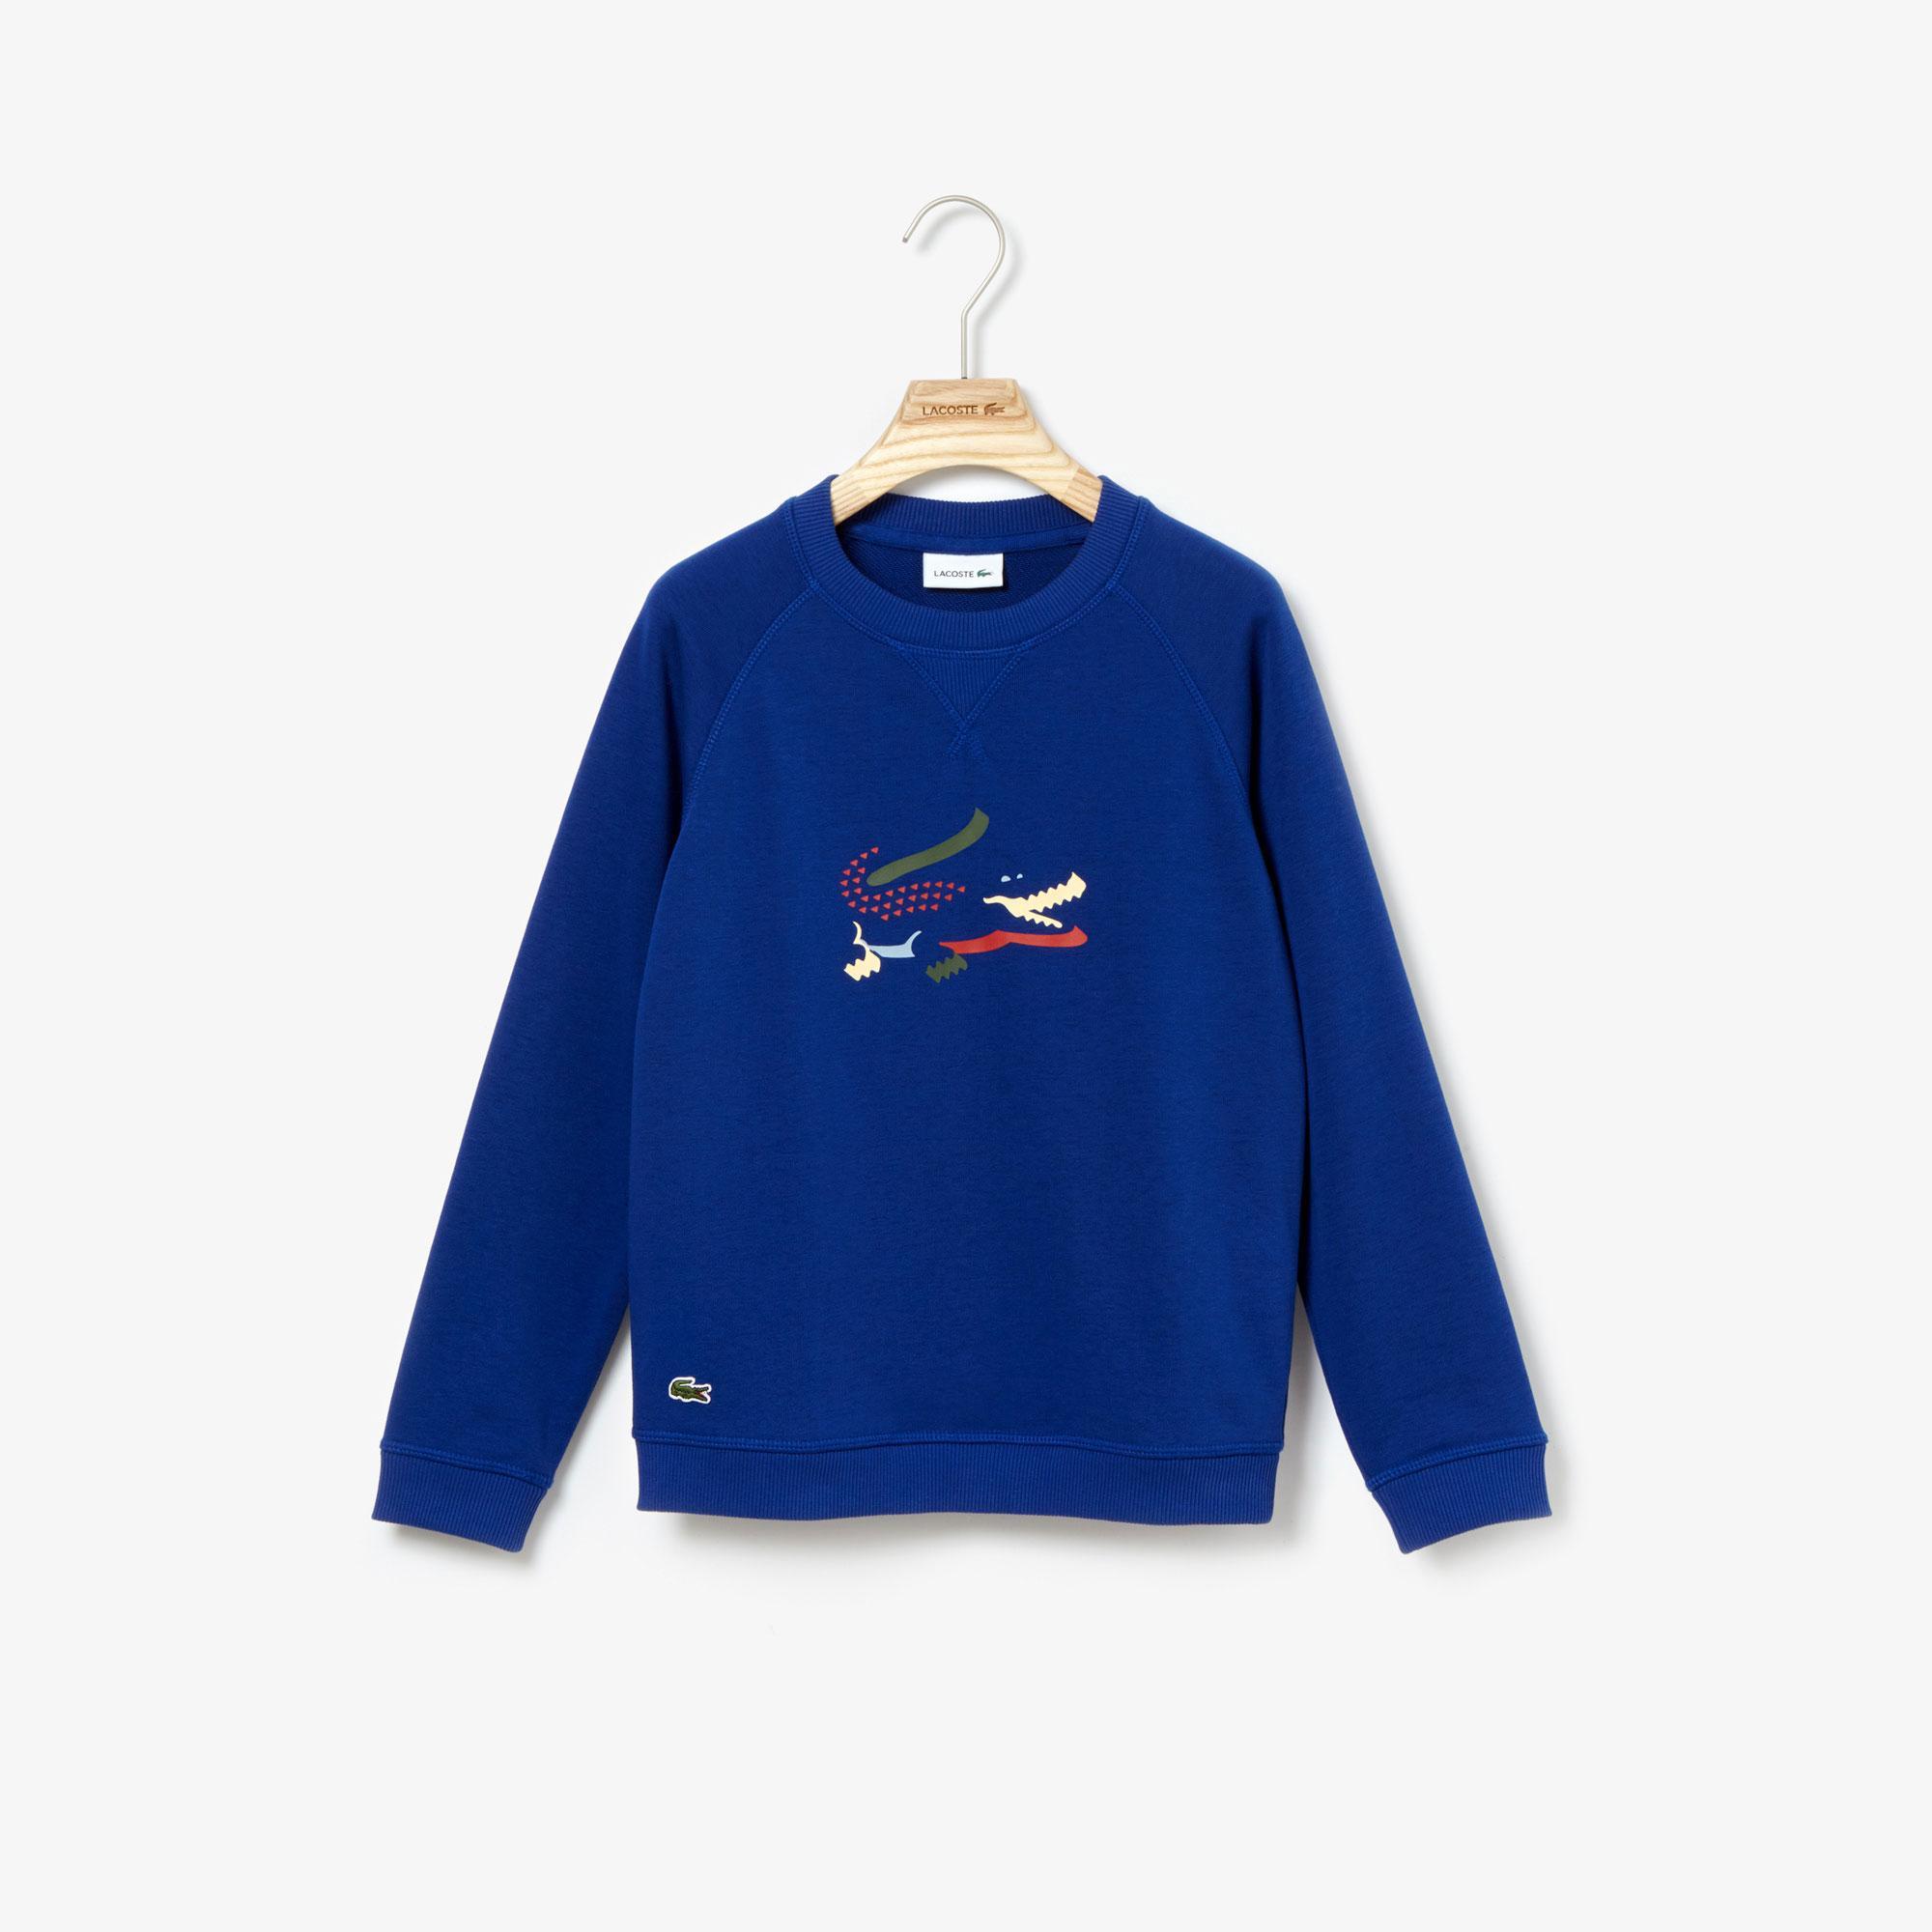 Lacoste Çocuk Lacivert Sweatshirt